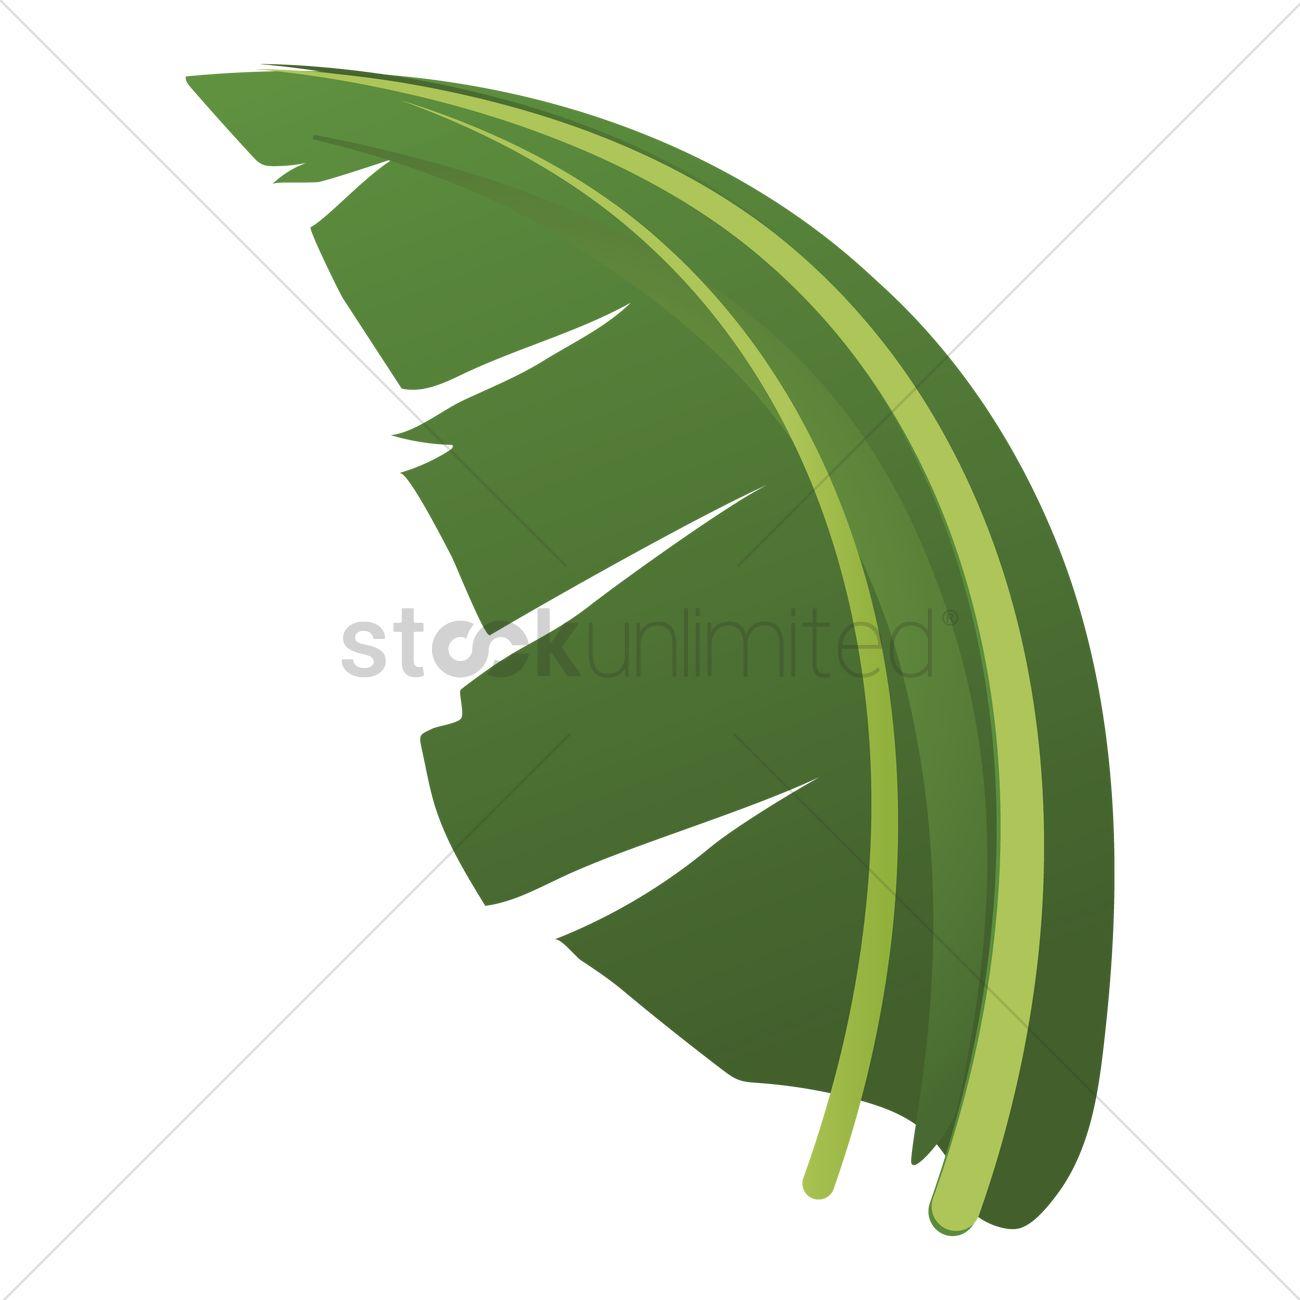 1300x1300 Clip Art Banana Leaves Set Of Palm Decorative Tropical Foliage